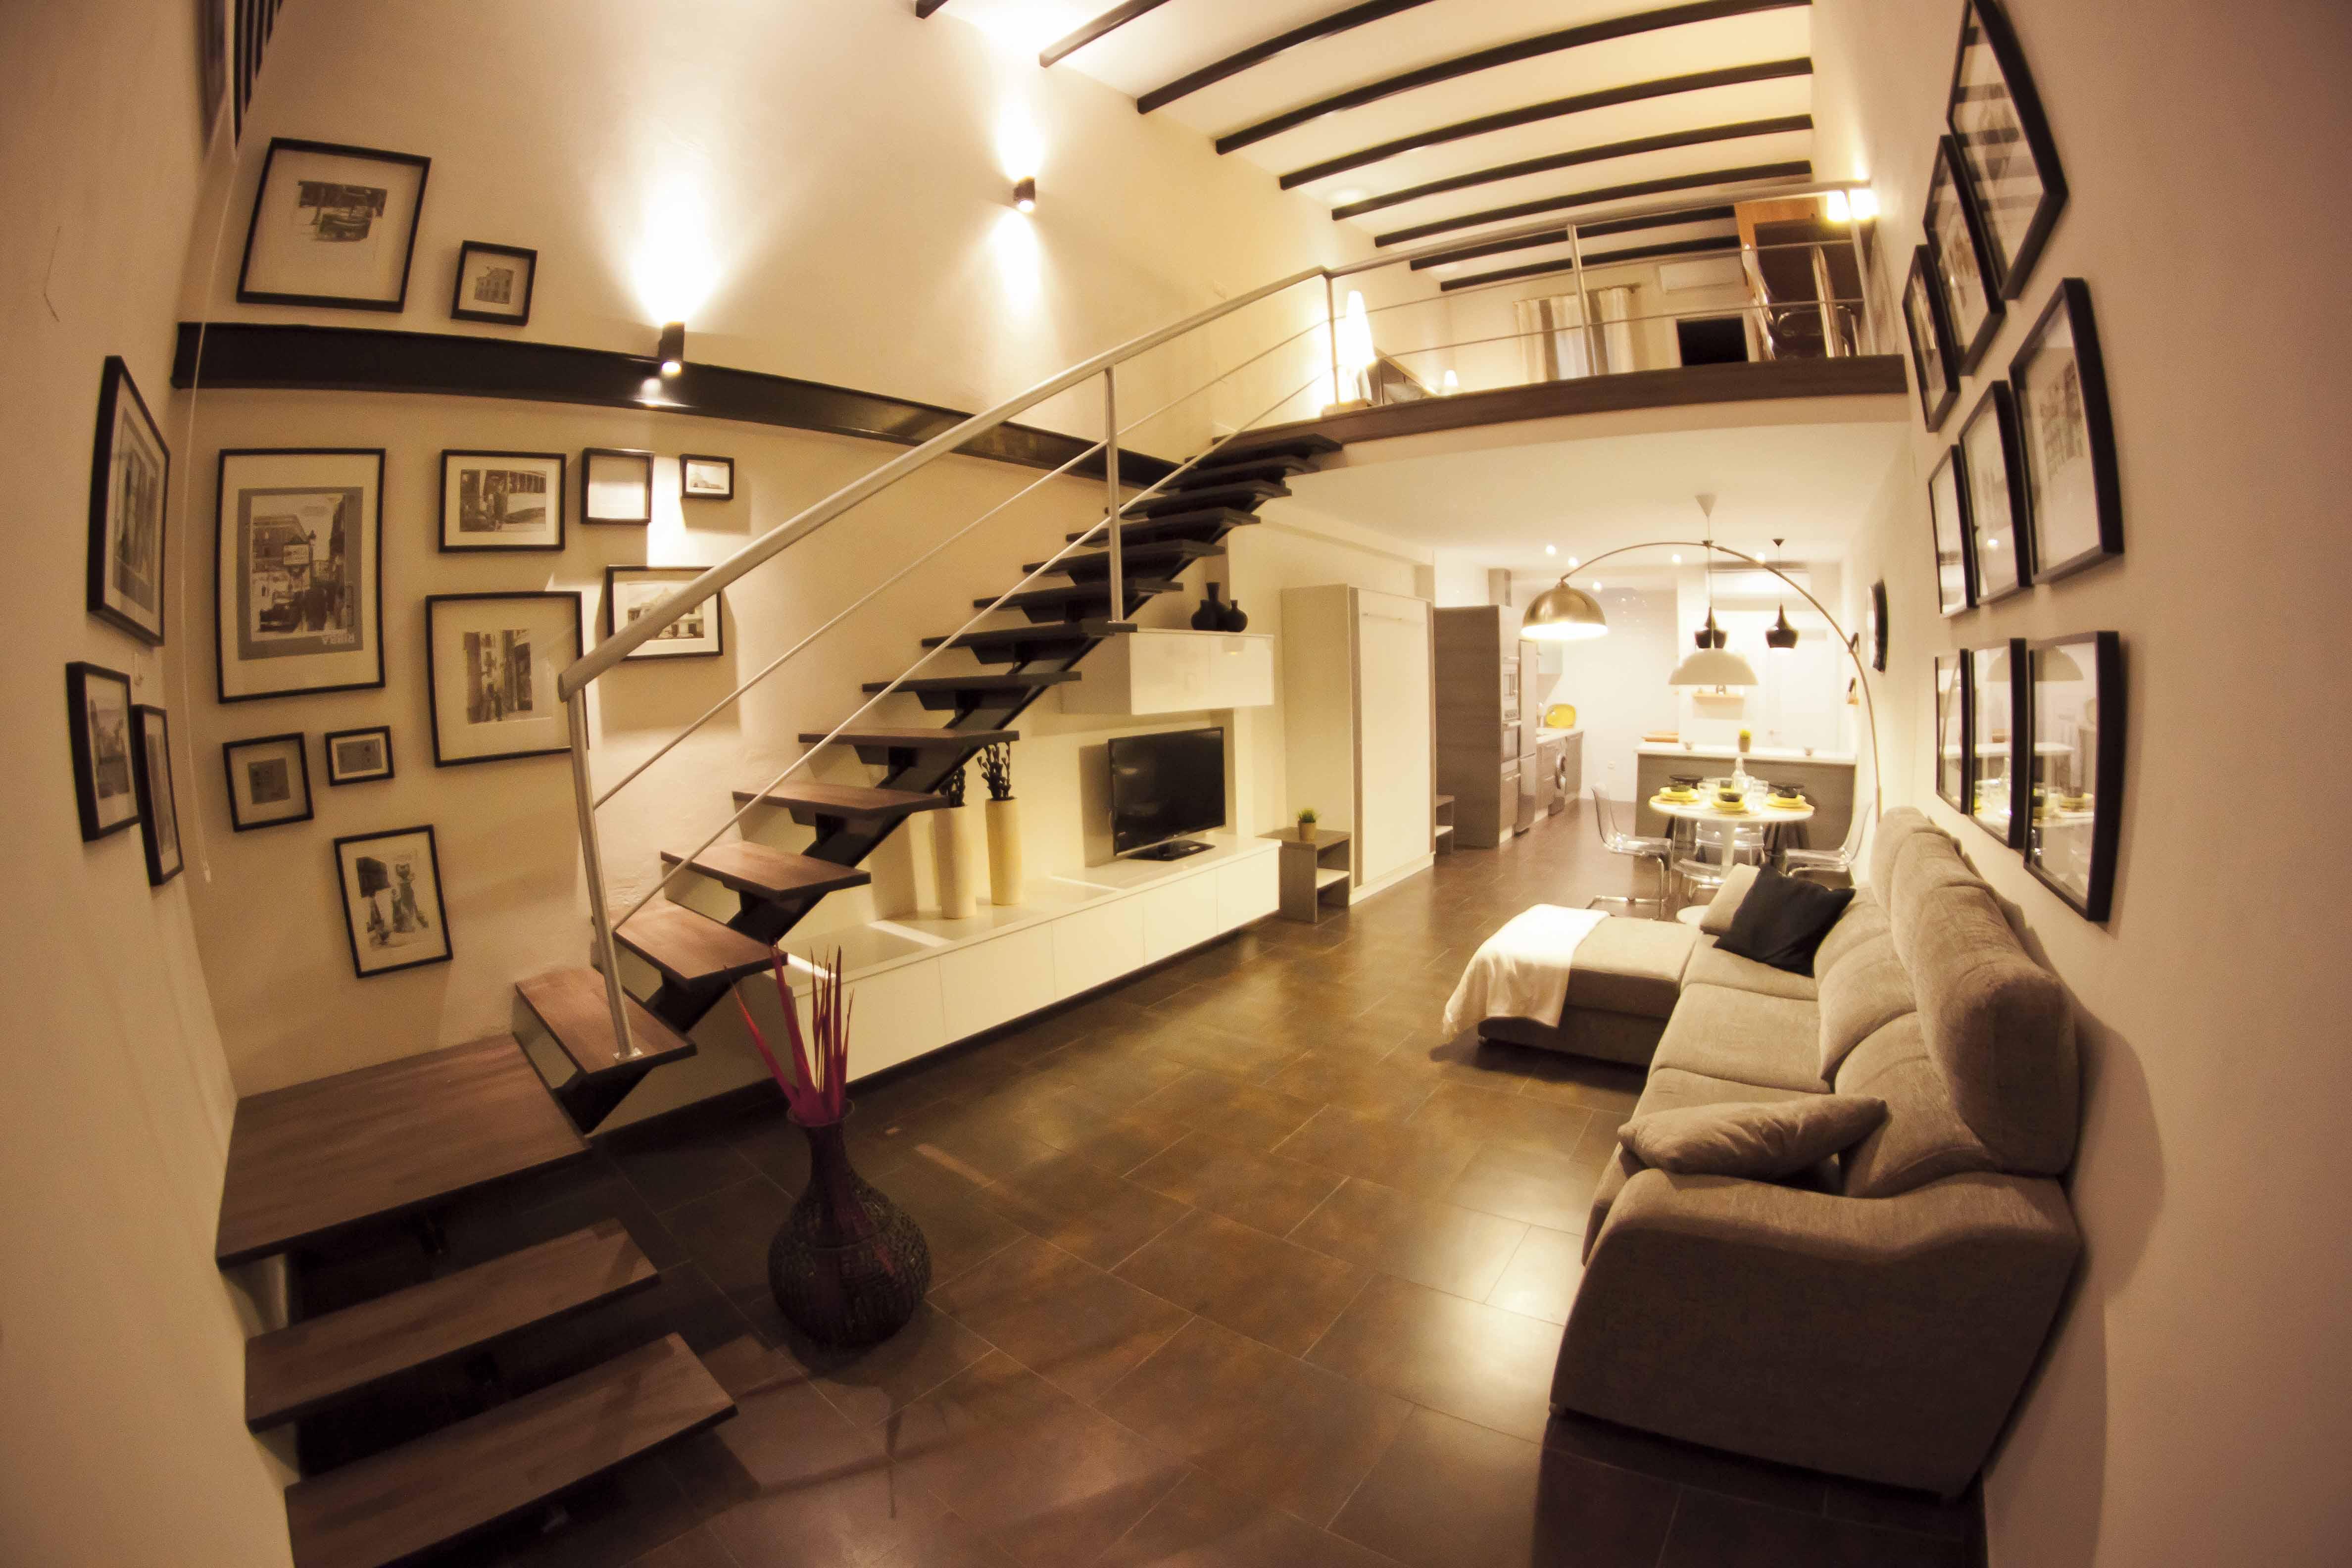 Alquilar un loft en malaga